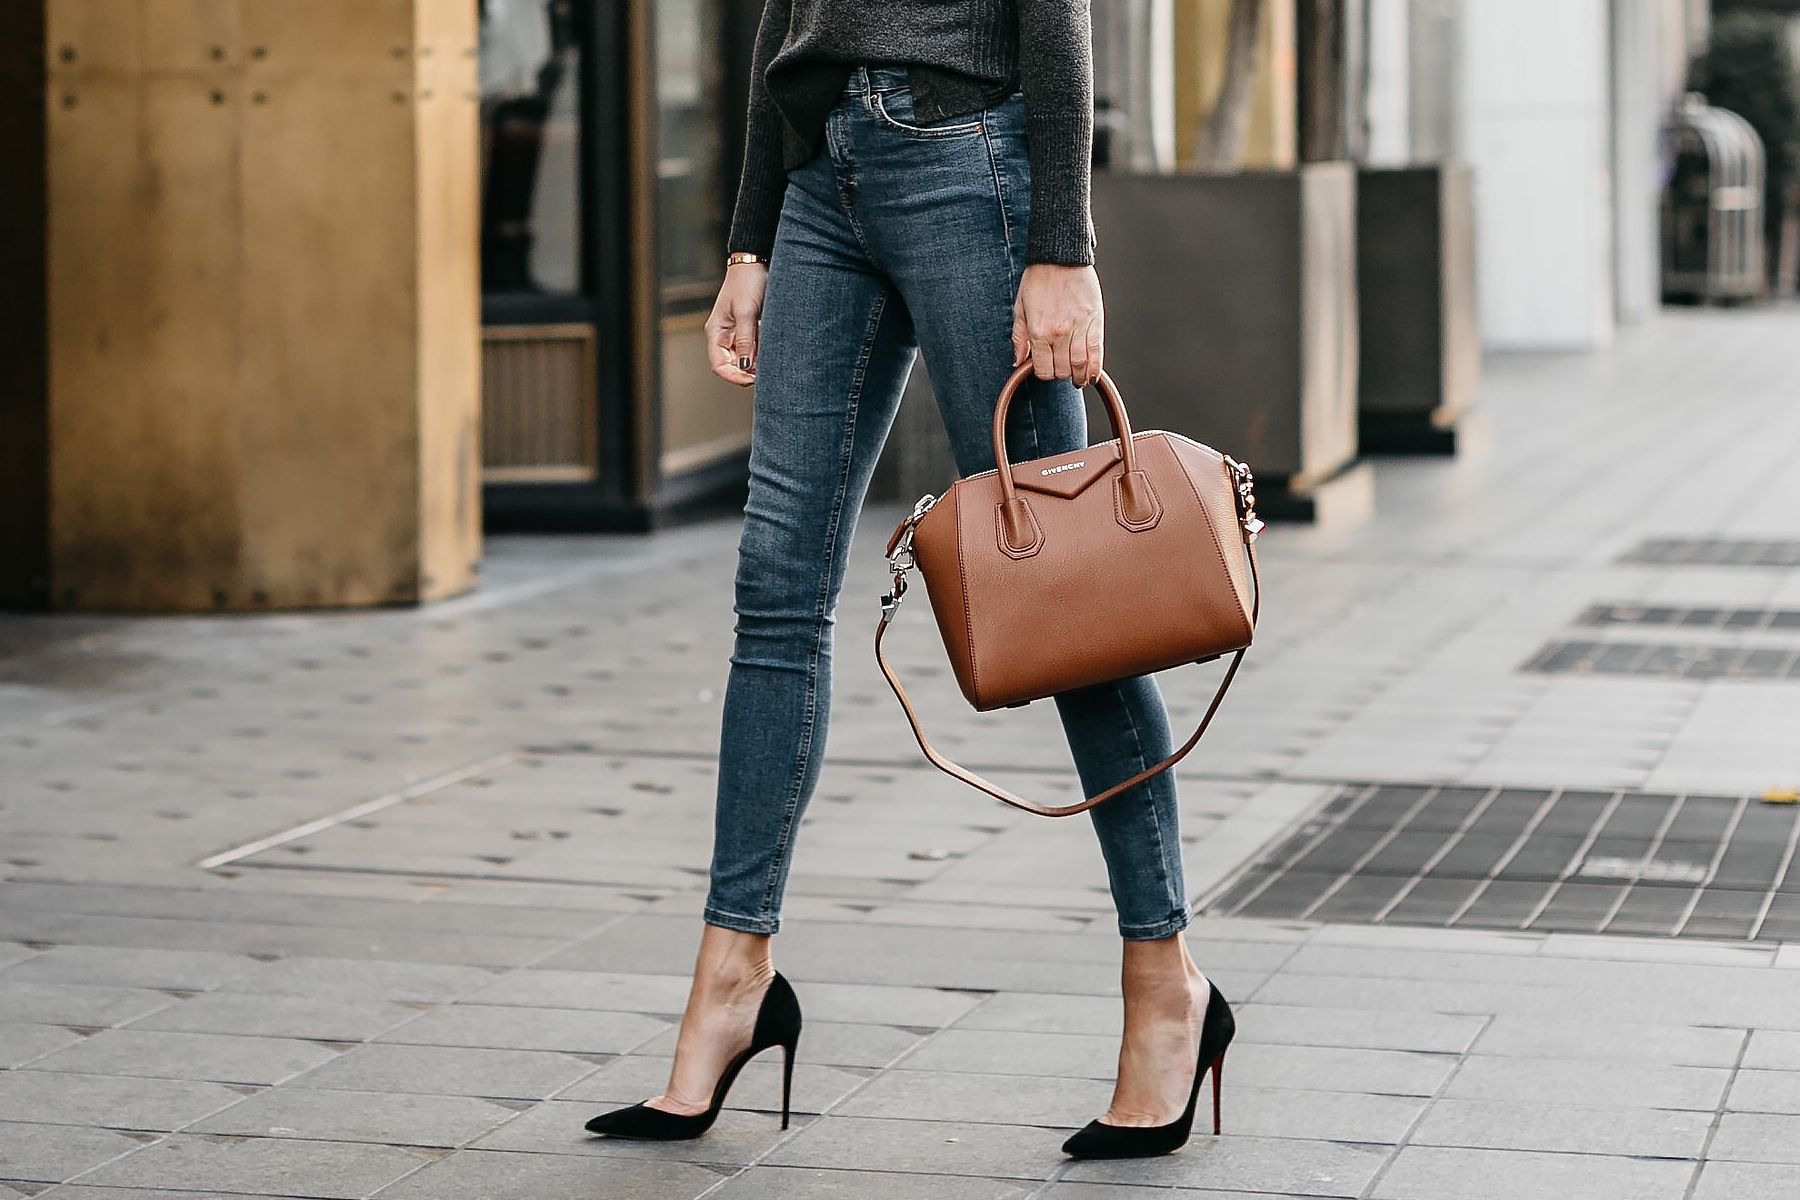 744117b417b5 Givenchy Antigona Cognac Handbag Denim Skinny Jeans Black Pumps Fashion  Jackson Dallas Blogger Fashion Blogger Street Style